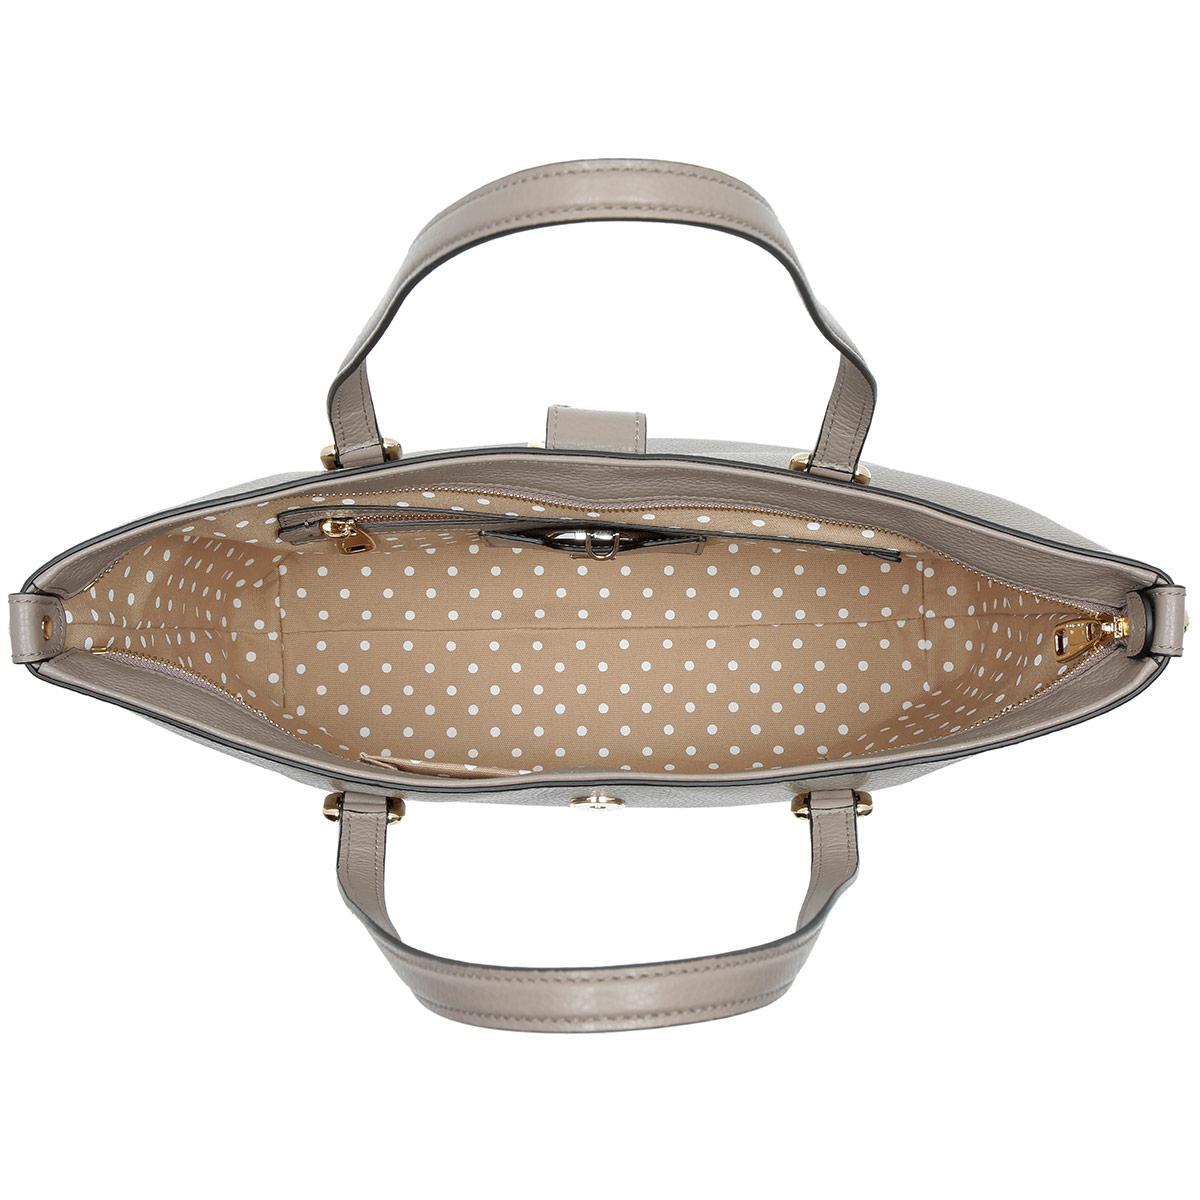 Dolce   Gabbana Dolce Drummed Calfskin Shopping Bag Fango Chiaro - Lyst 30482574e40e6